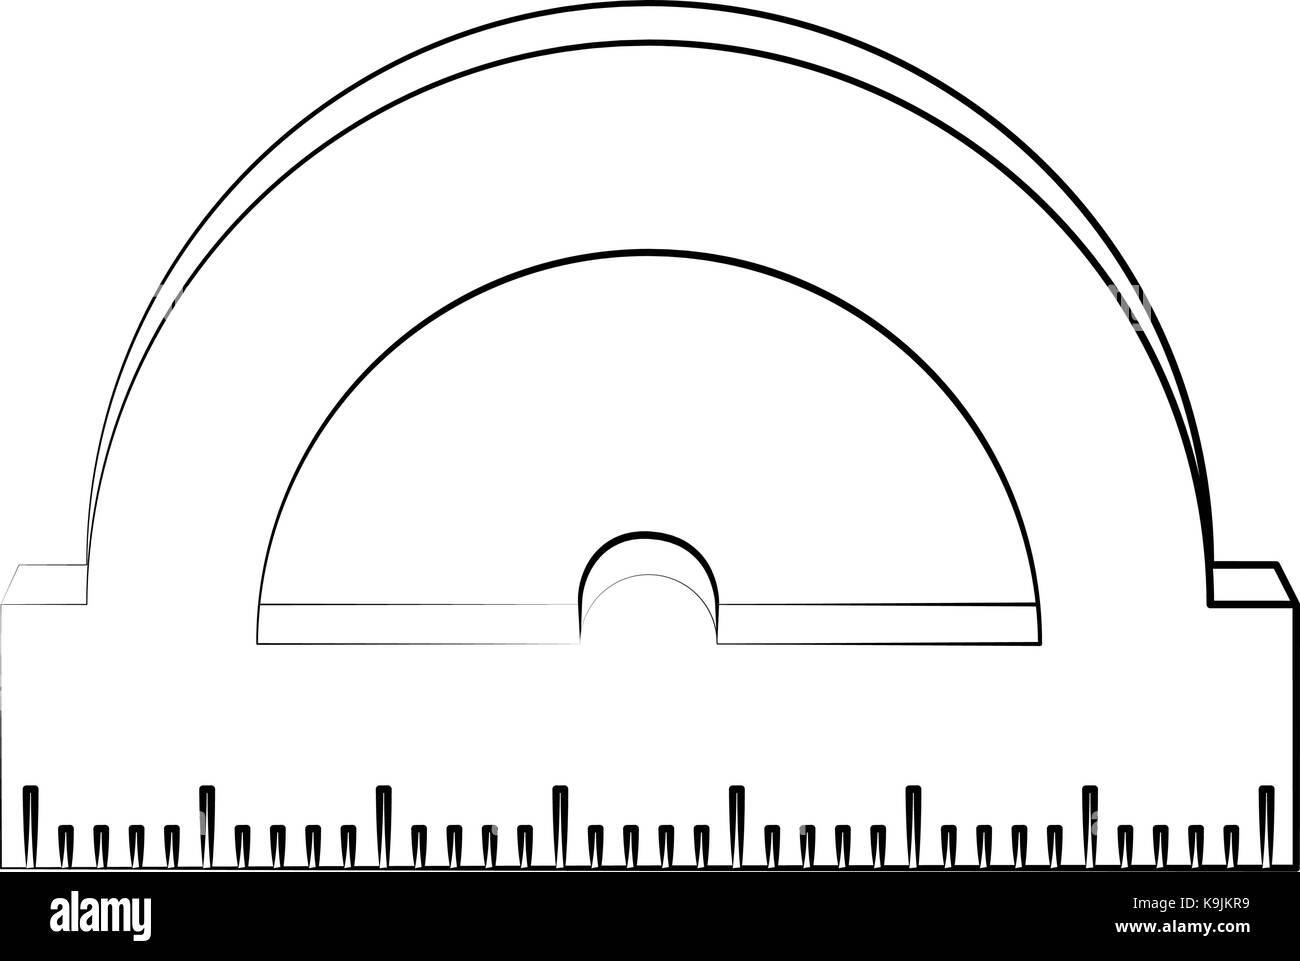 angle meter ruler - Stock Image